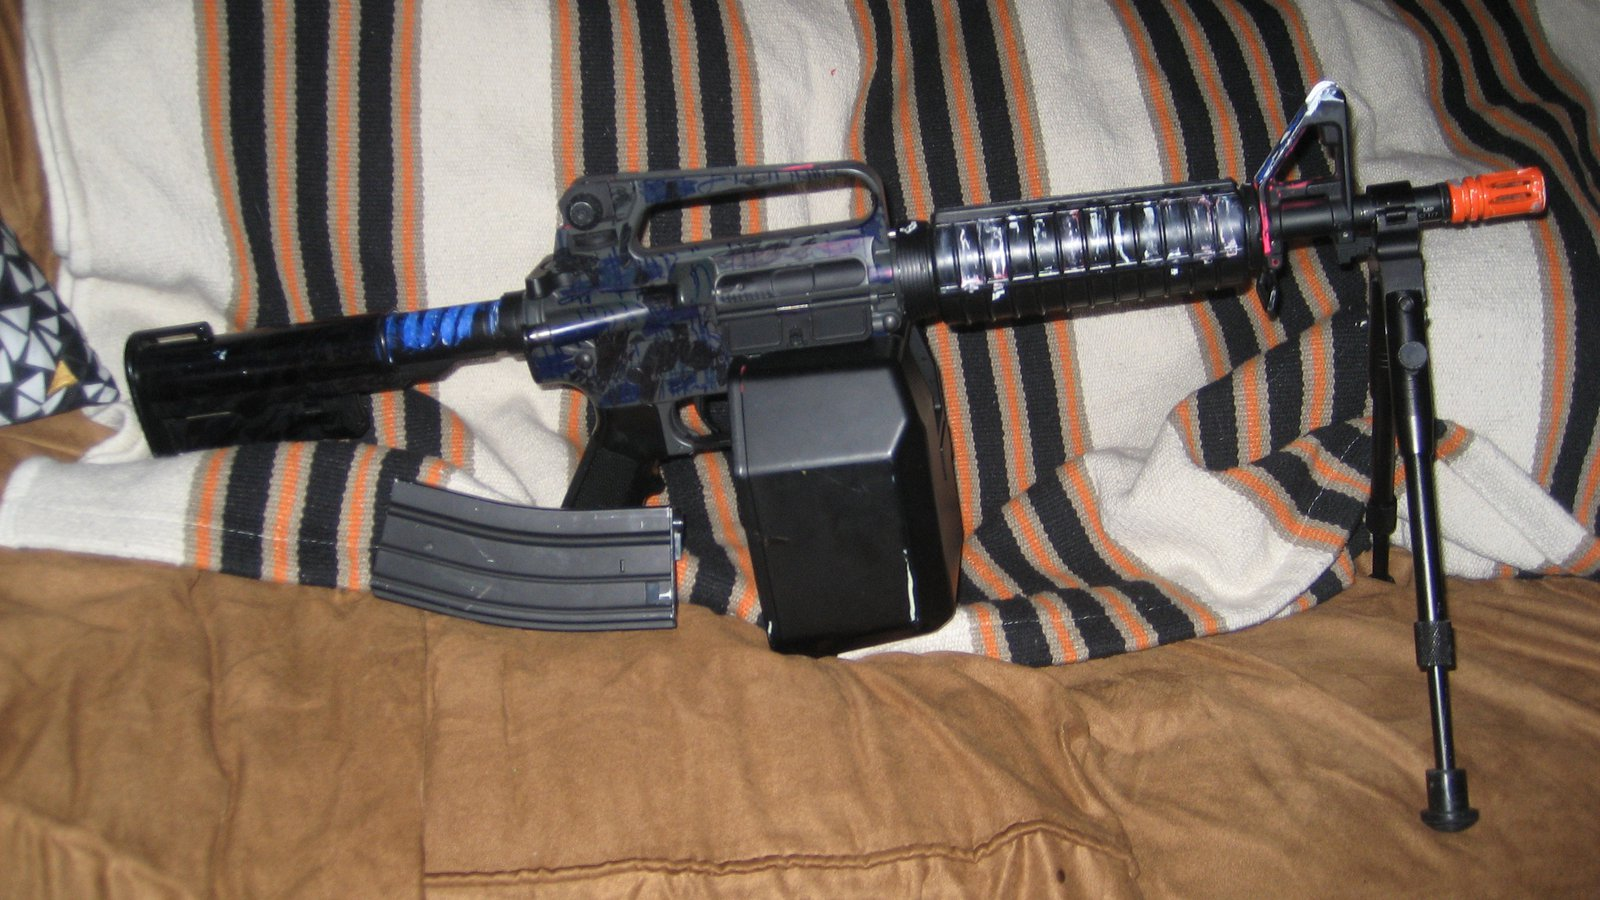 Guns alot - 2 of 2